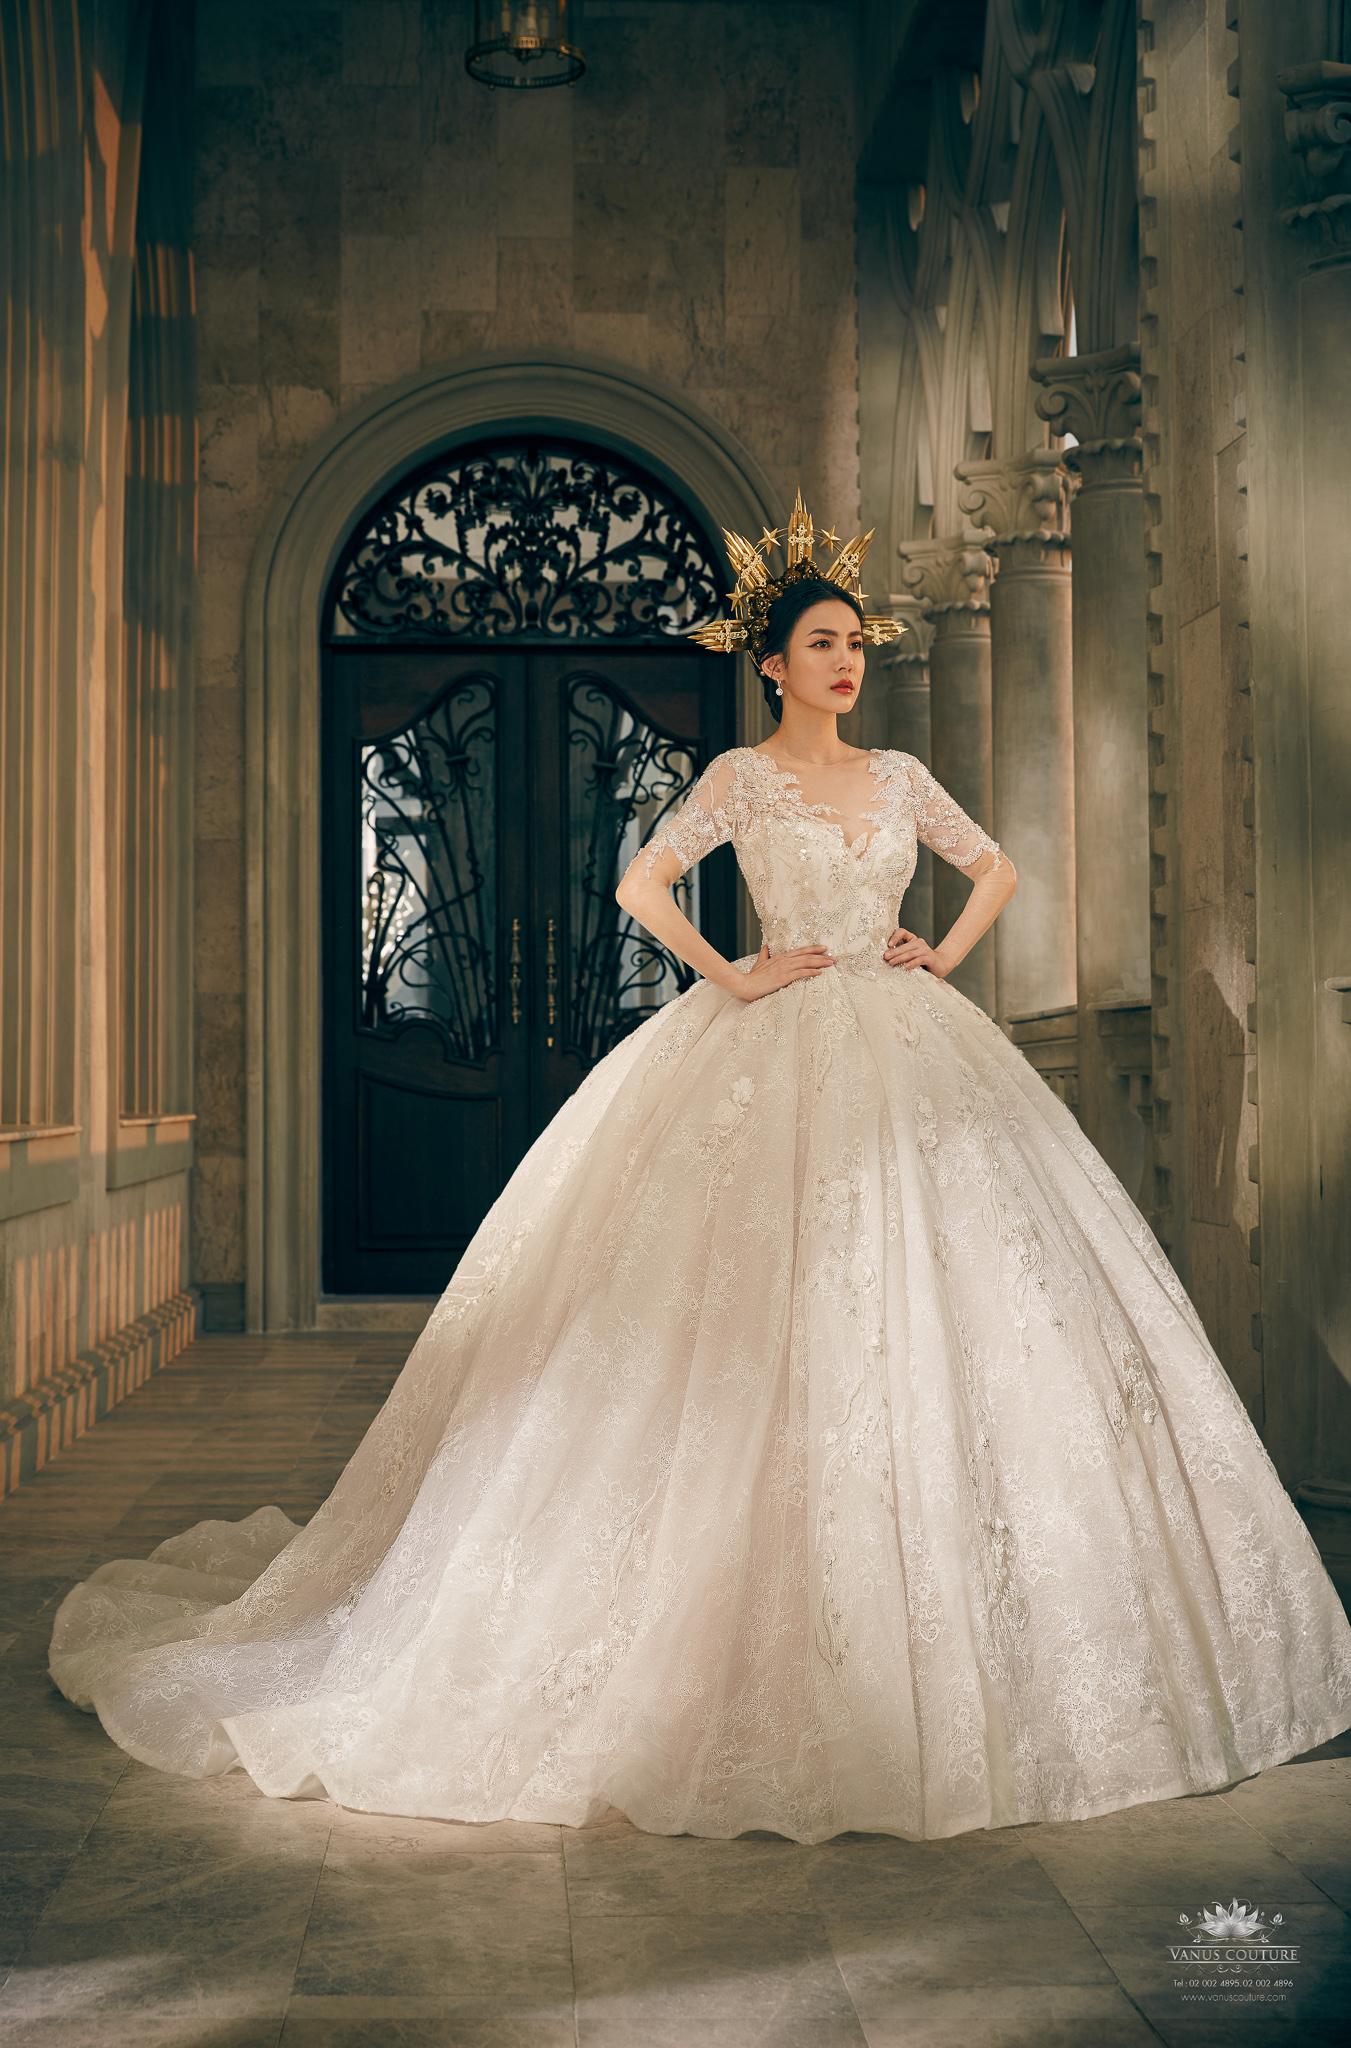 Superball wedding dress - Gybzy